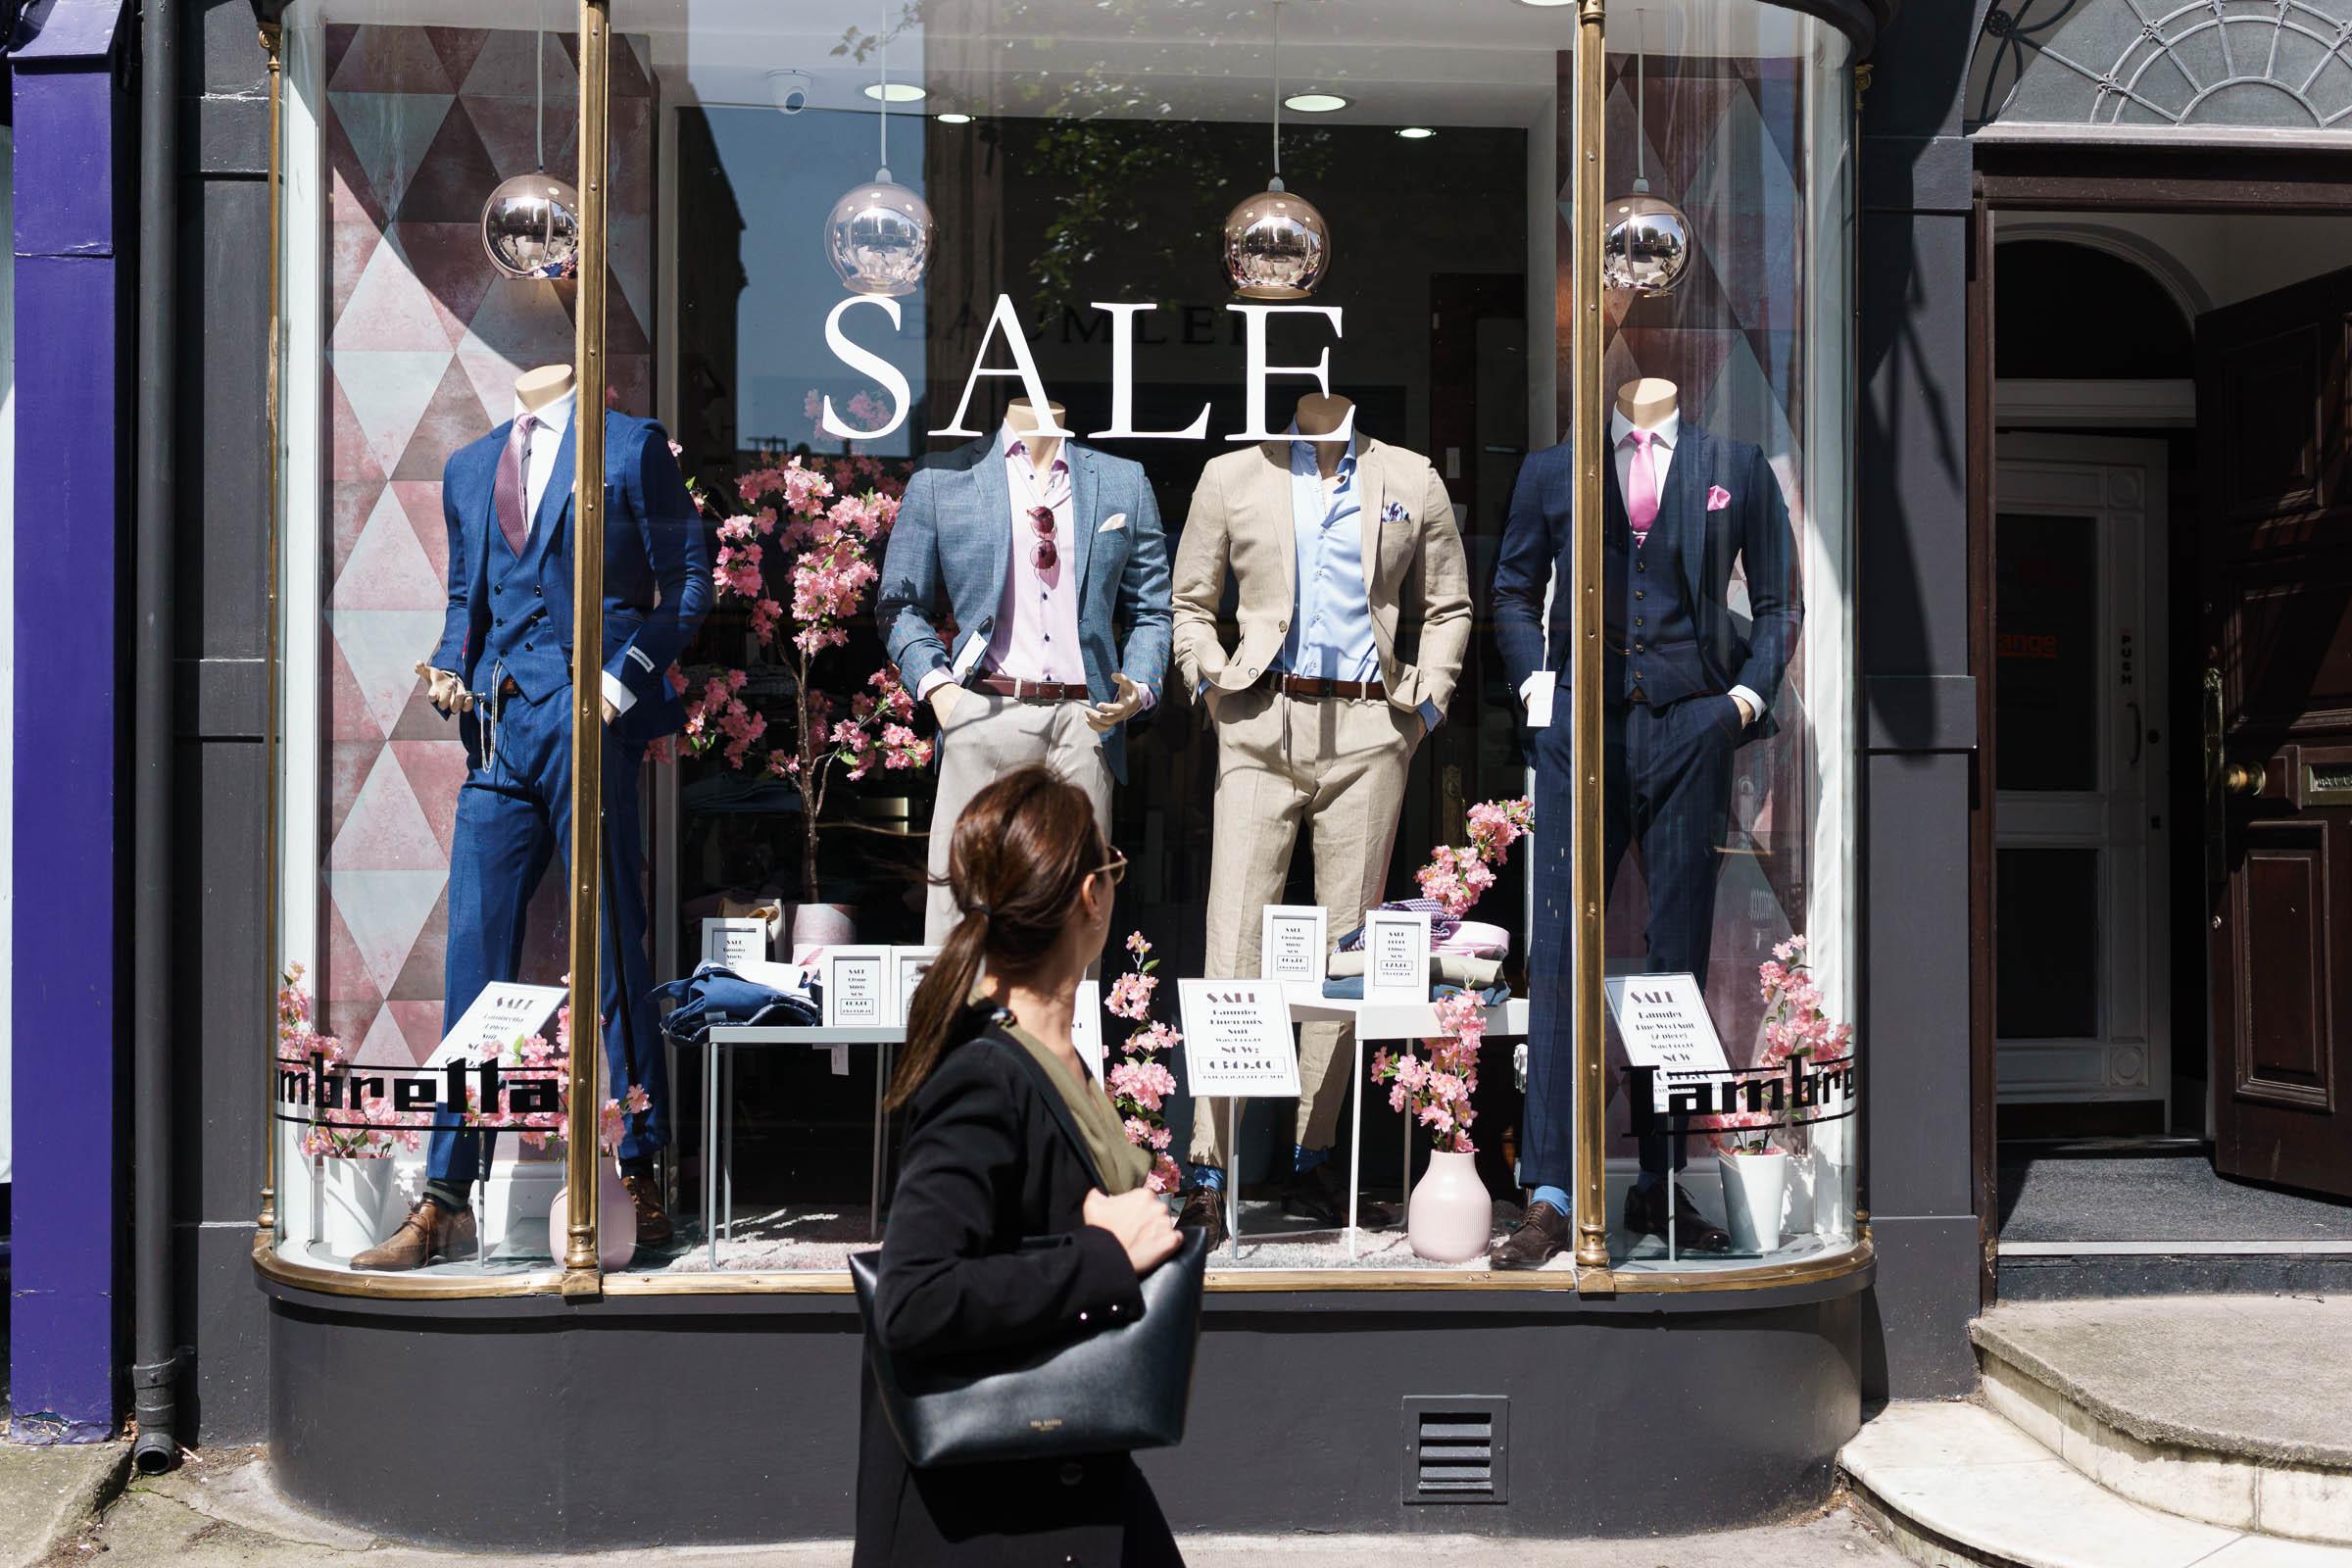 Woman looks in the window of a store in Dublin